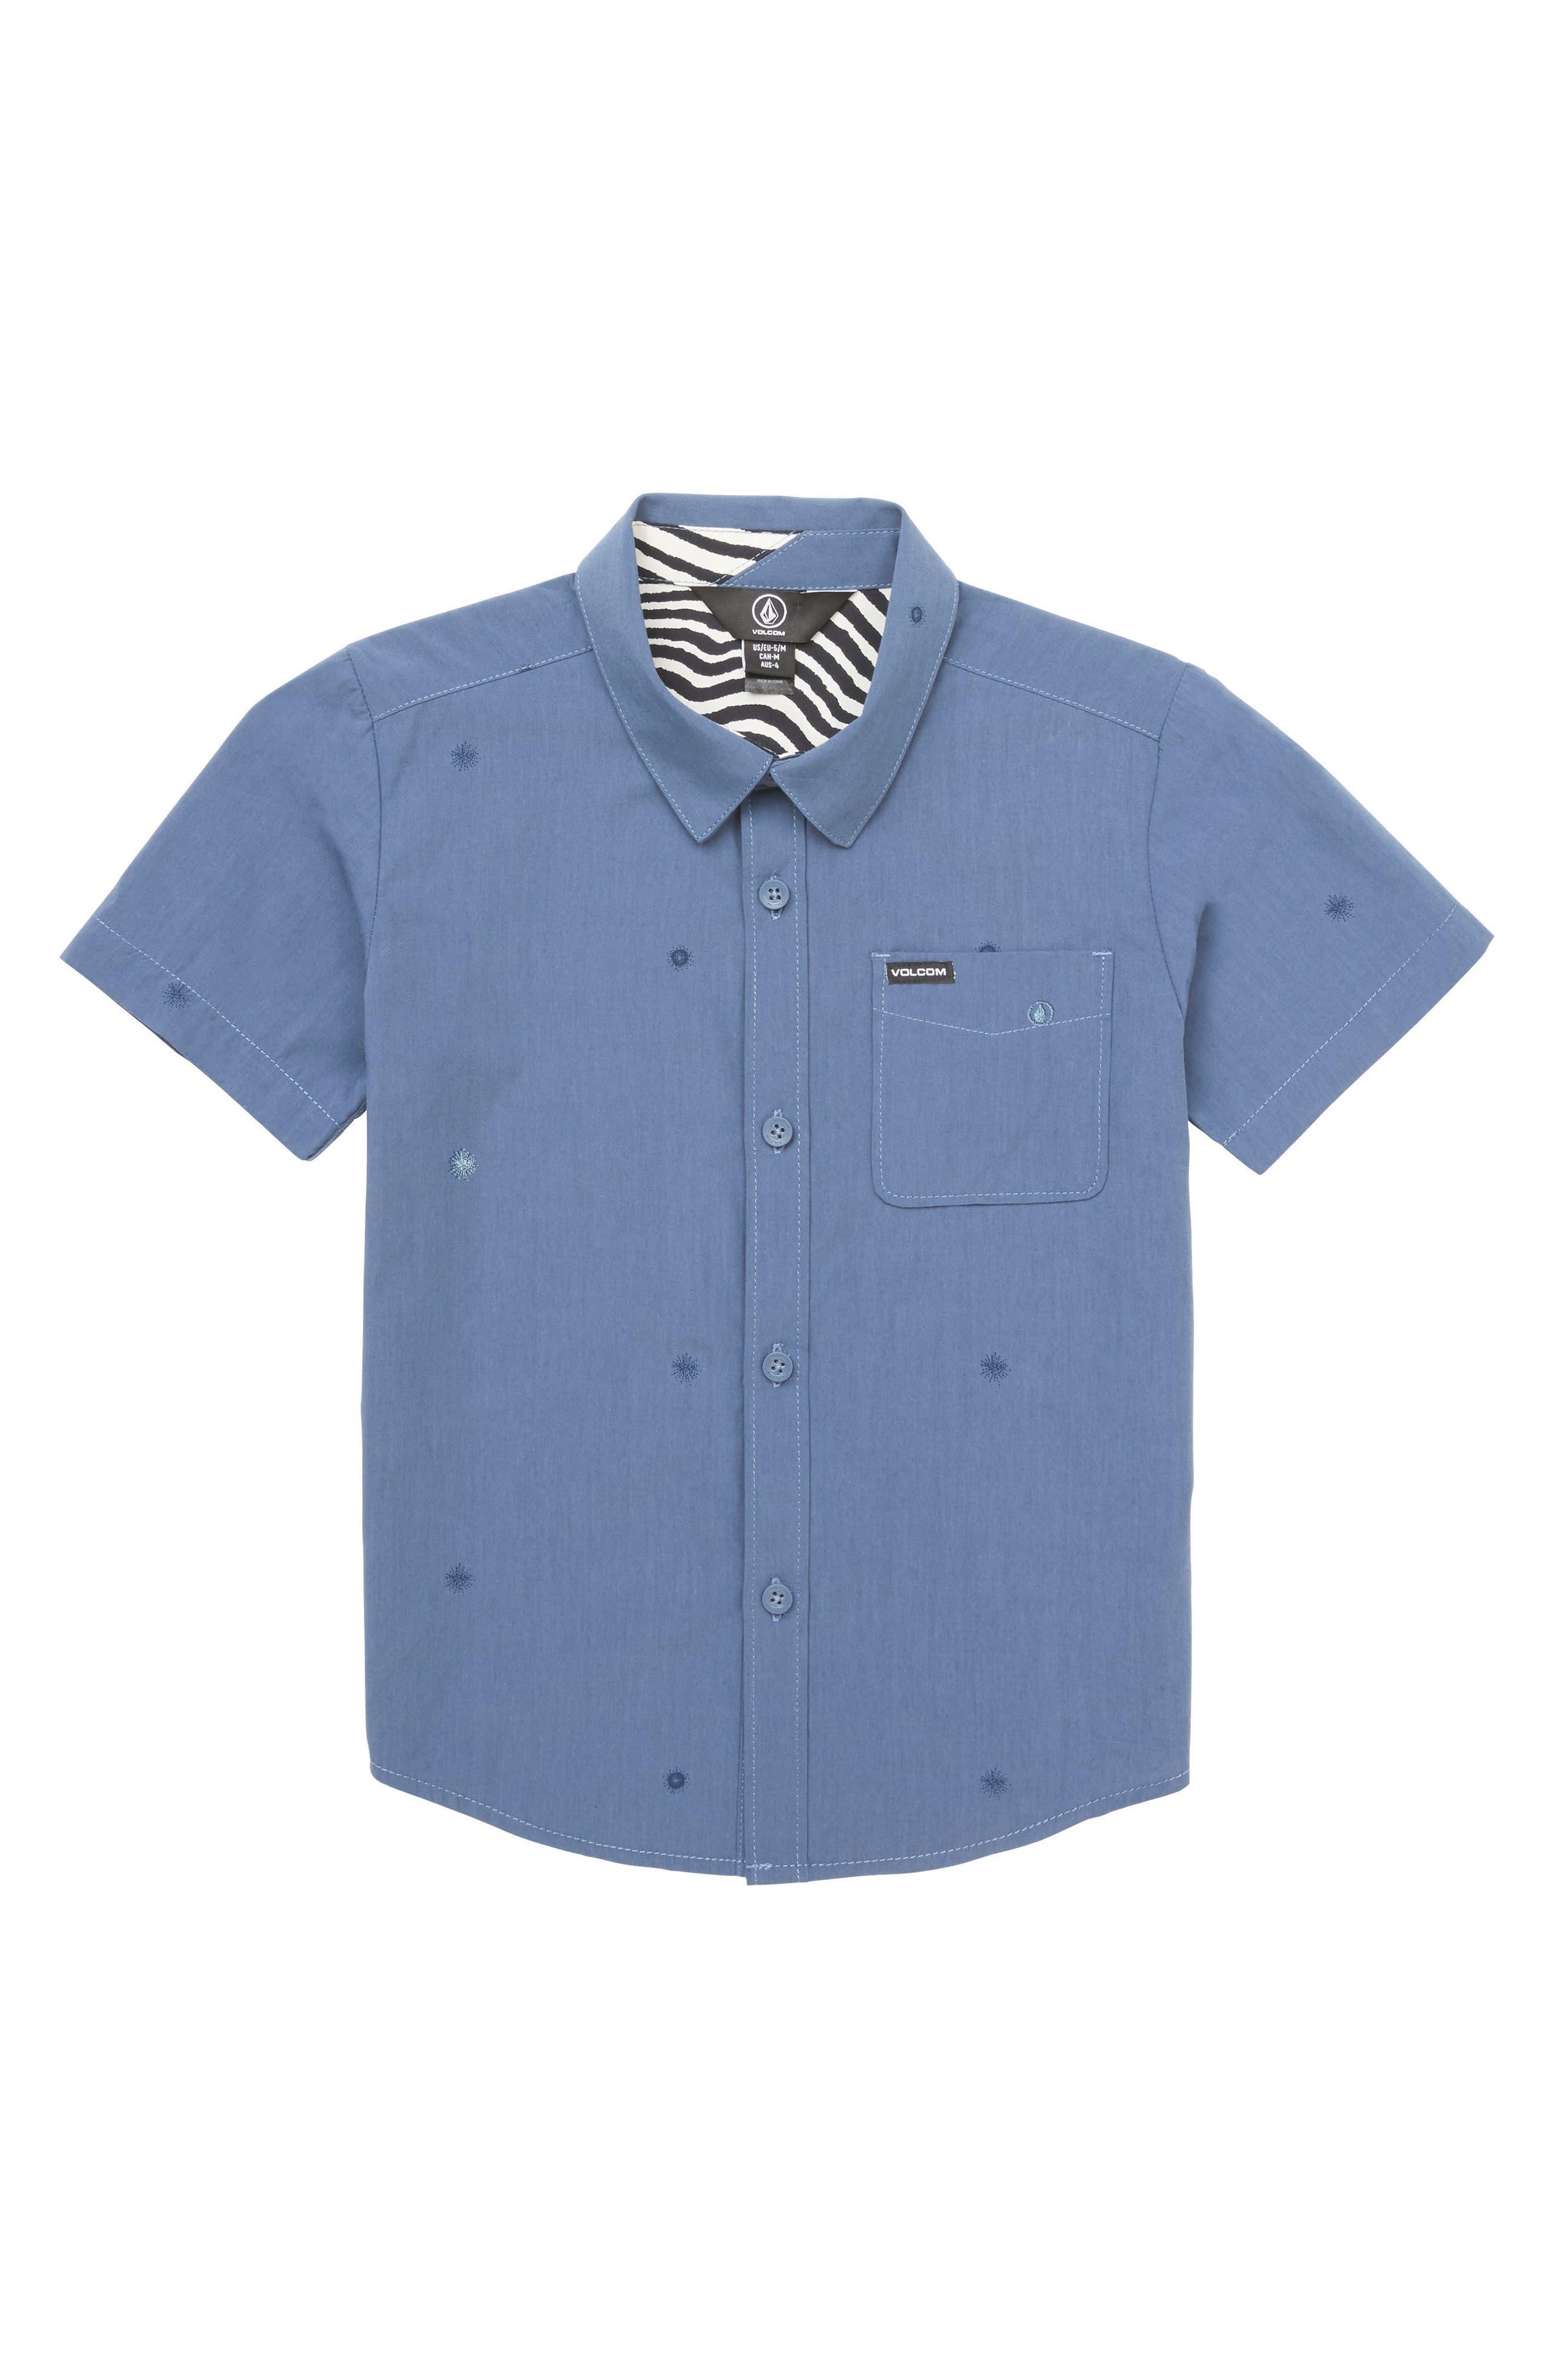 Bleeker Woven Shirt,                             Main thumbnail 1, color,                             Deep Blue